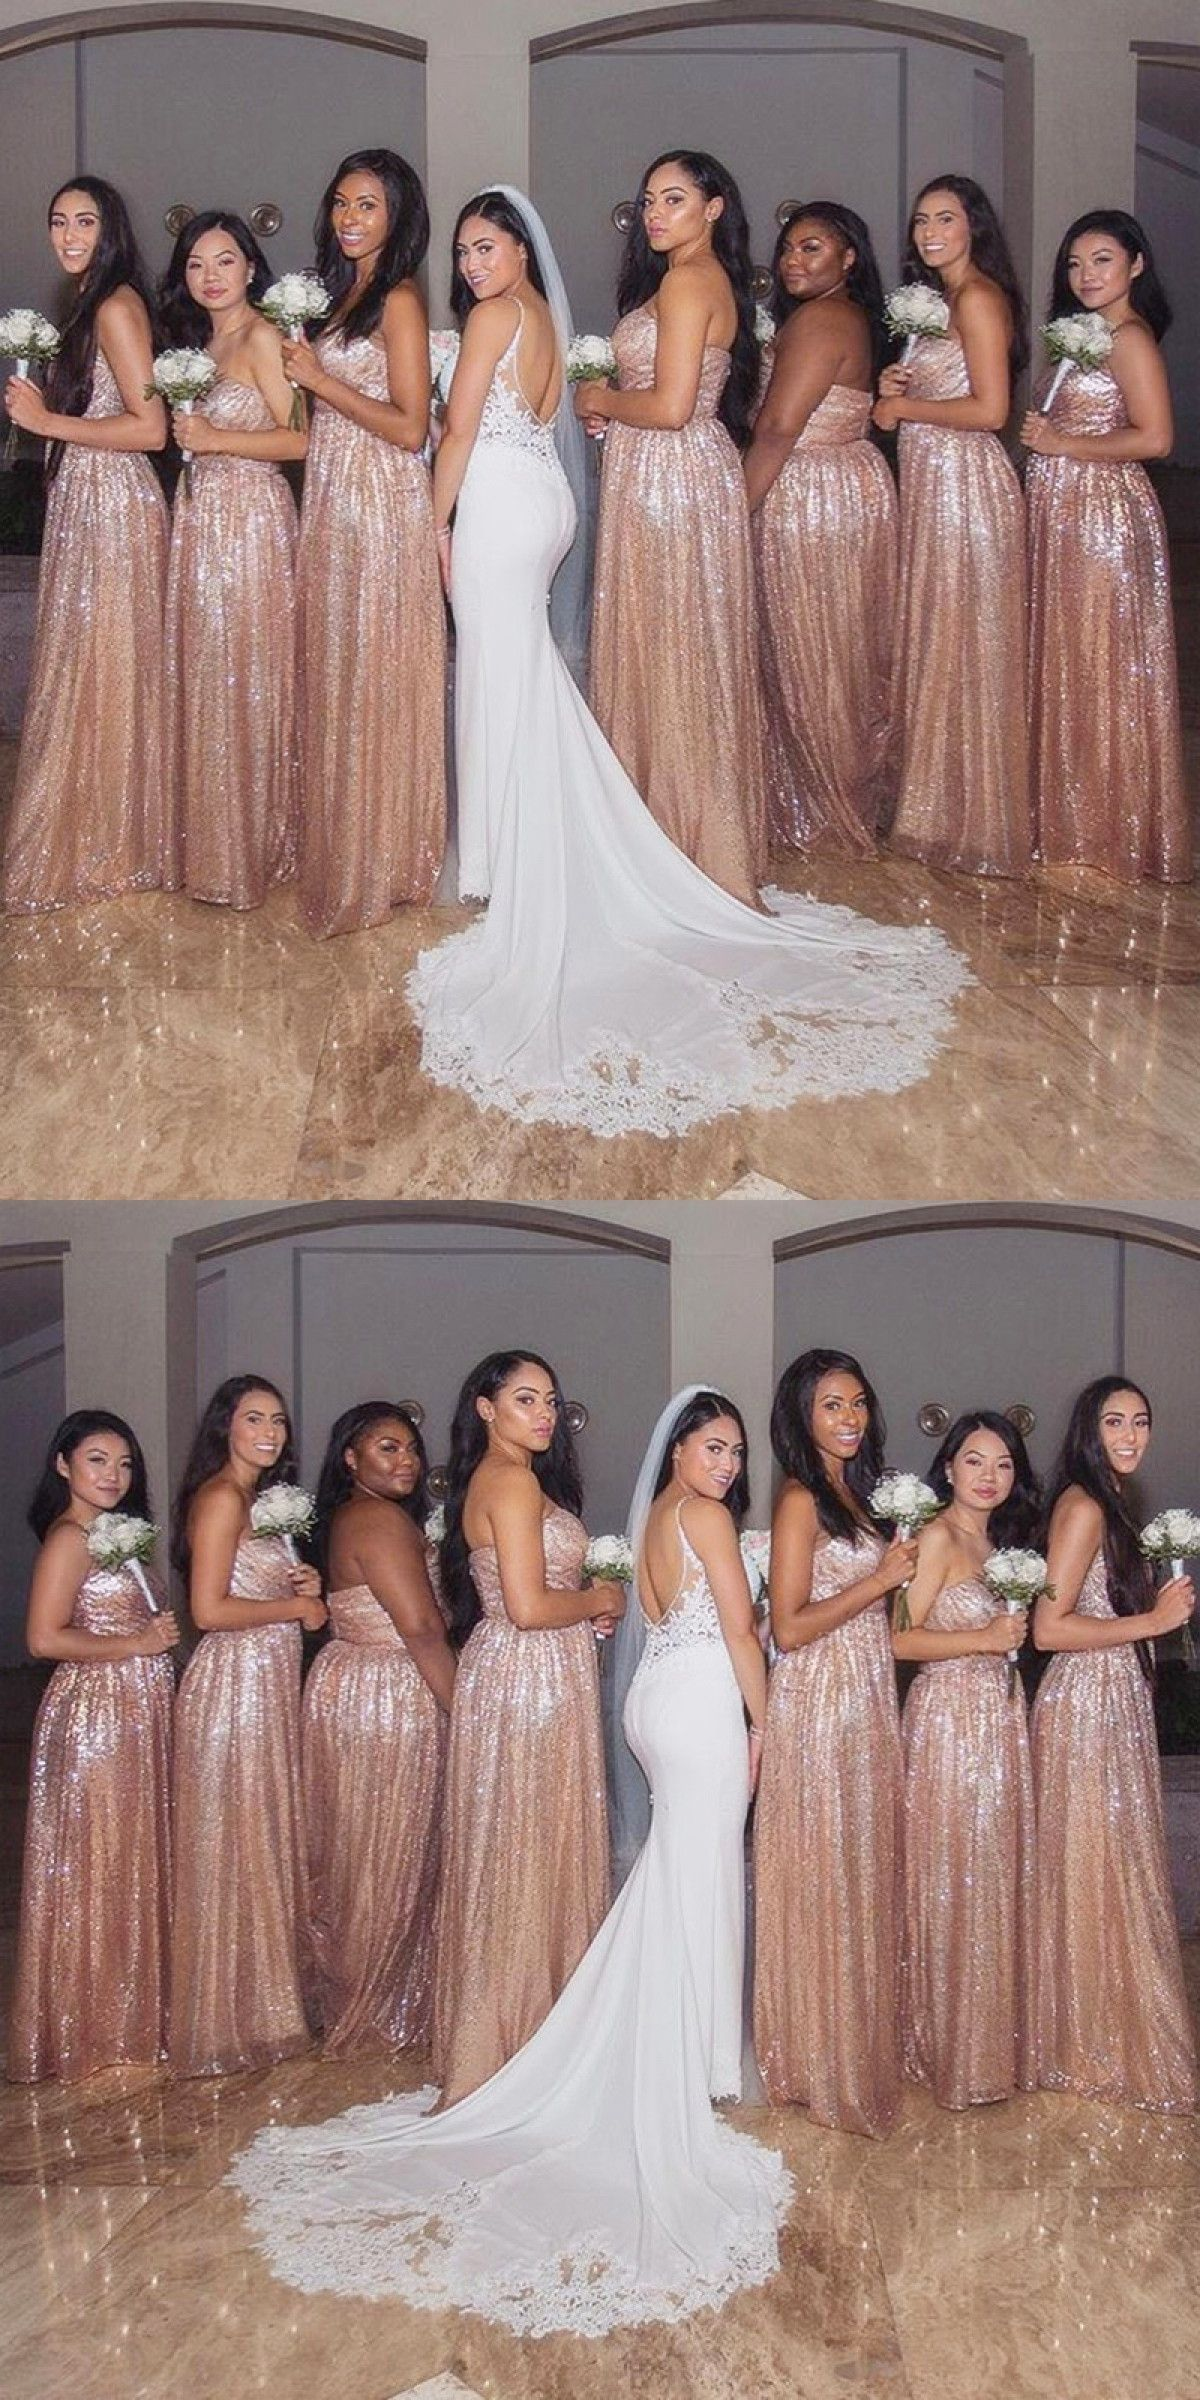 Sweetheart Bridesmaid Dresses Rose Gold Bridesmaid Dresses Long Sequ Rose Gold Sequin Bridesmaid Dress Sequin Bridesmaid Dresses Long Gold Bridesmaid Dresses [ 2400 x 1200 Pixel ]